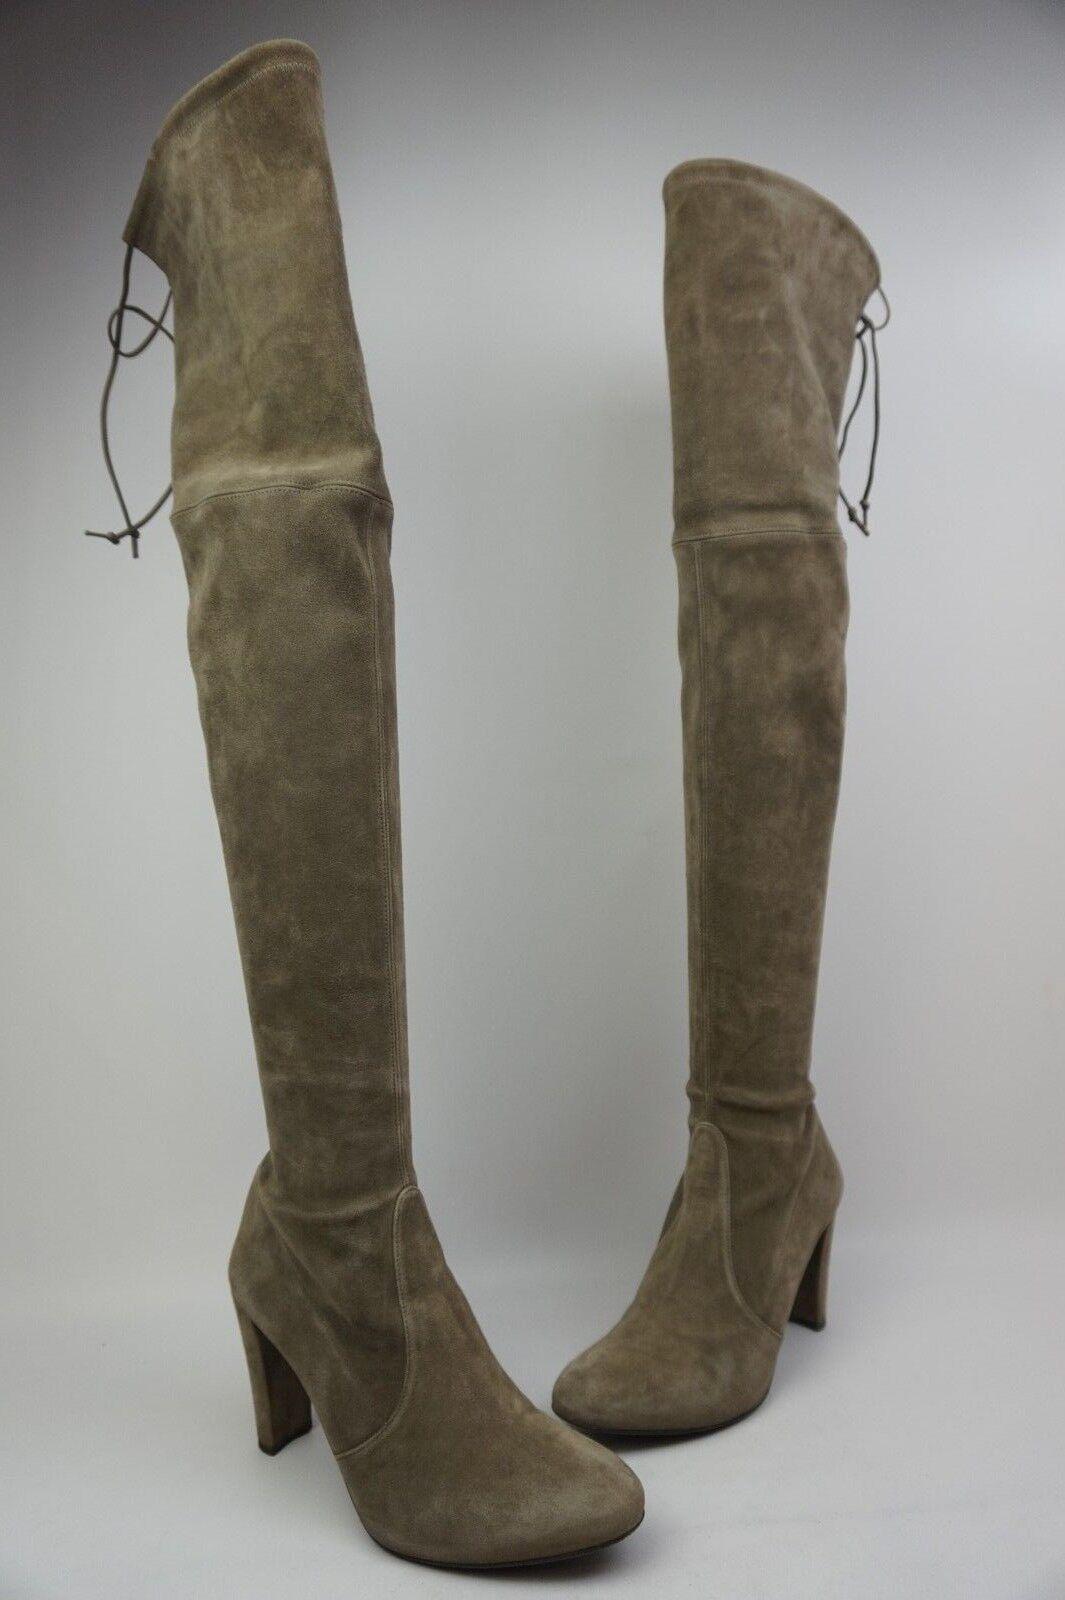 Stuart Weitzman Highland Over the Knee Praline Grey Suede Boots Size 9 M.